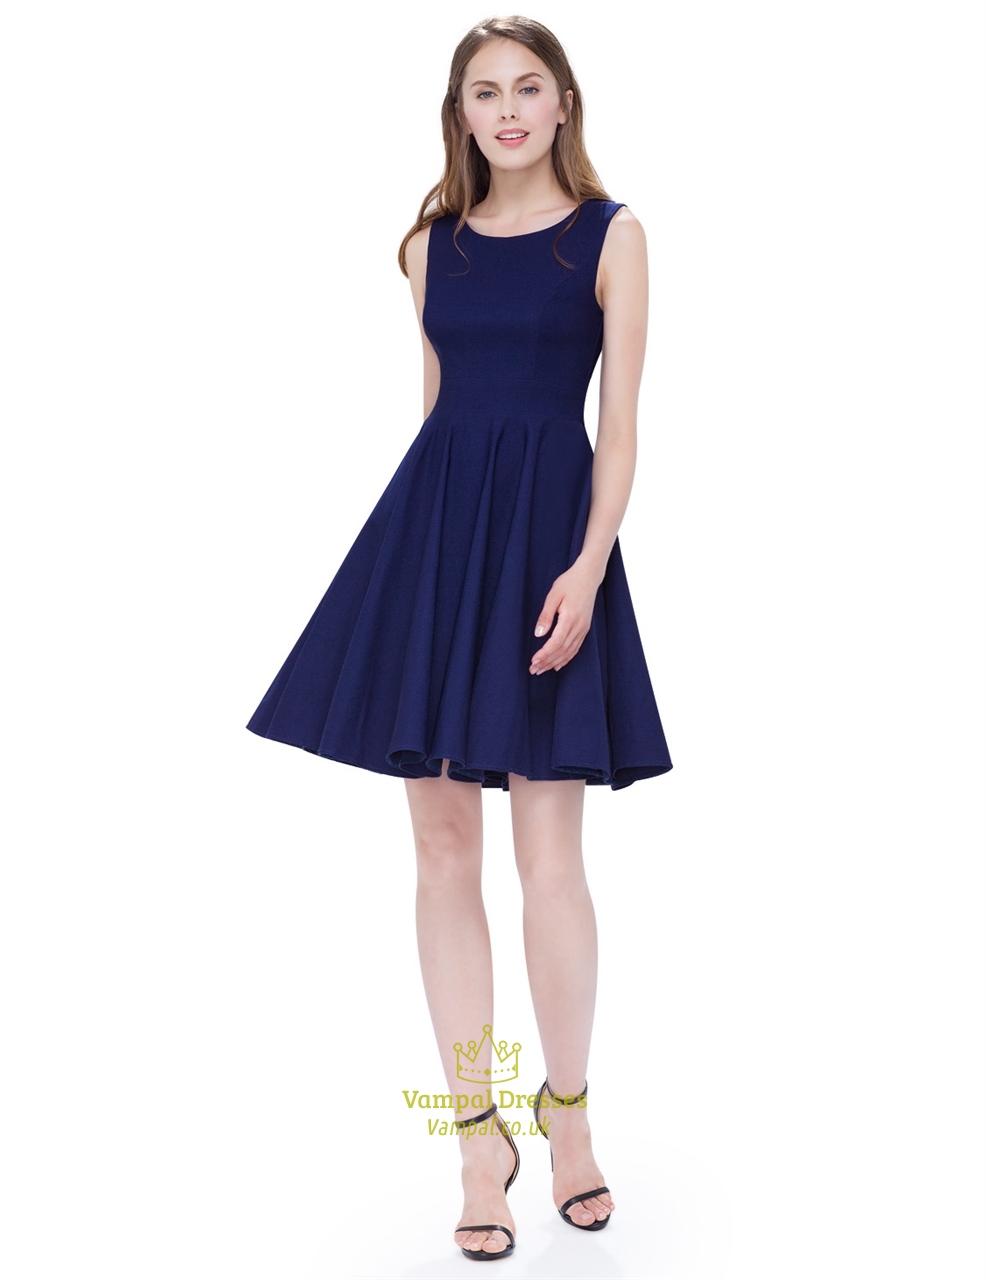 Vintage Navy Blue Scoop Neck Sleeveless Fit And Flare Cocktail Dress  Vampal Dresses